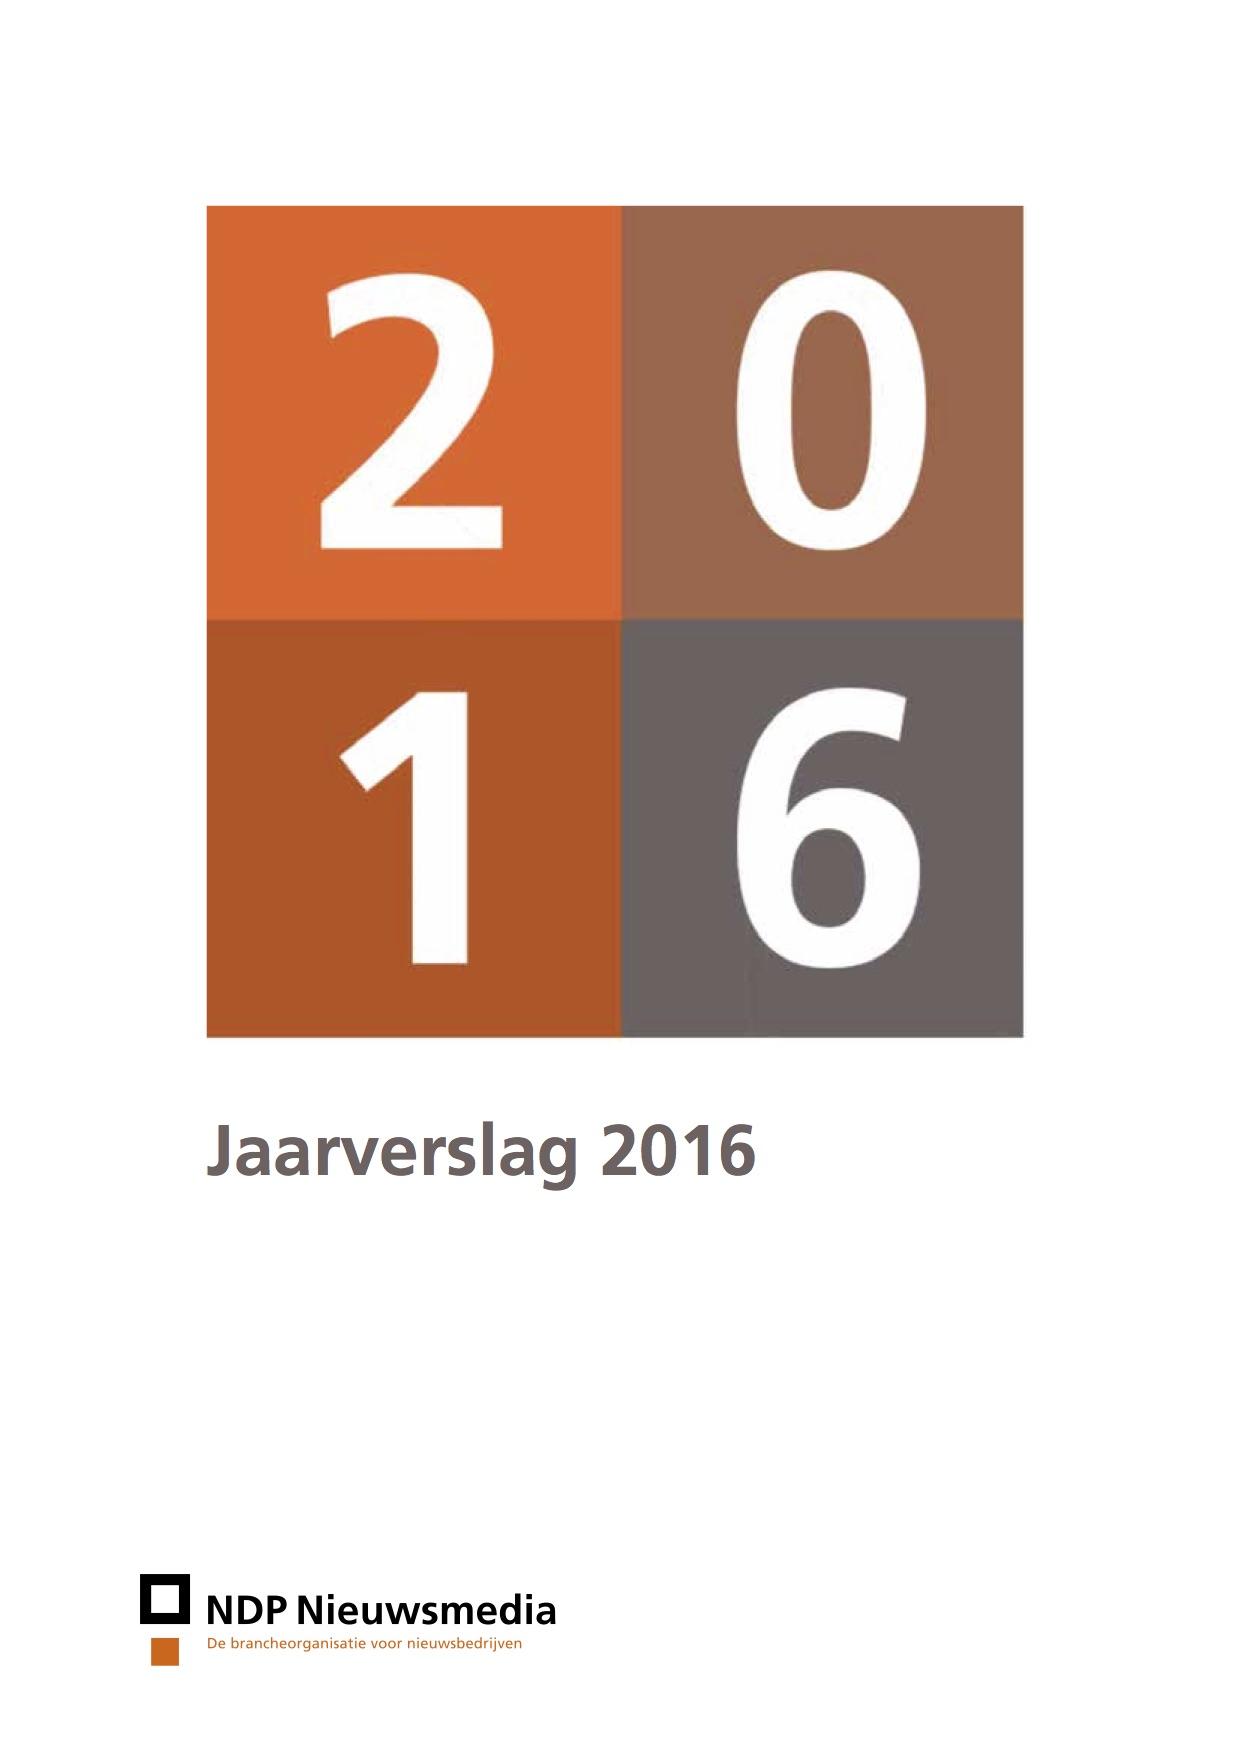 2016 Report of Dutch news media market by NDP Nieuwsmedia